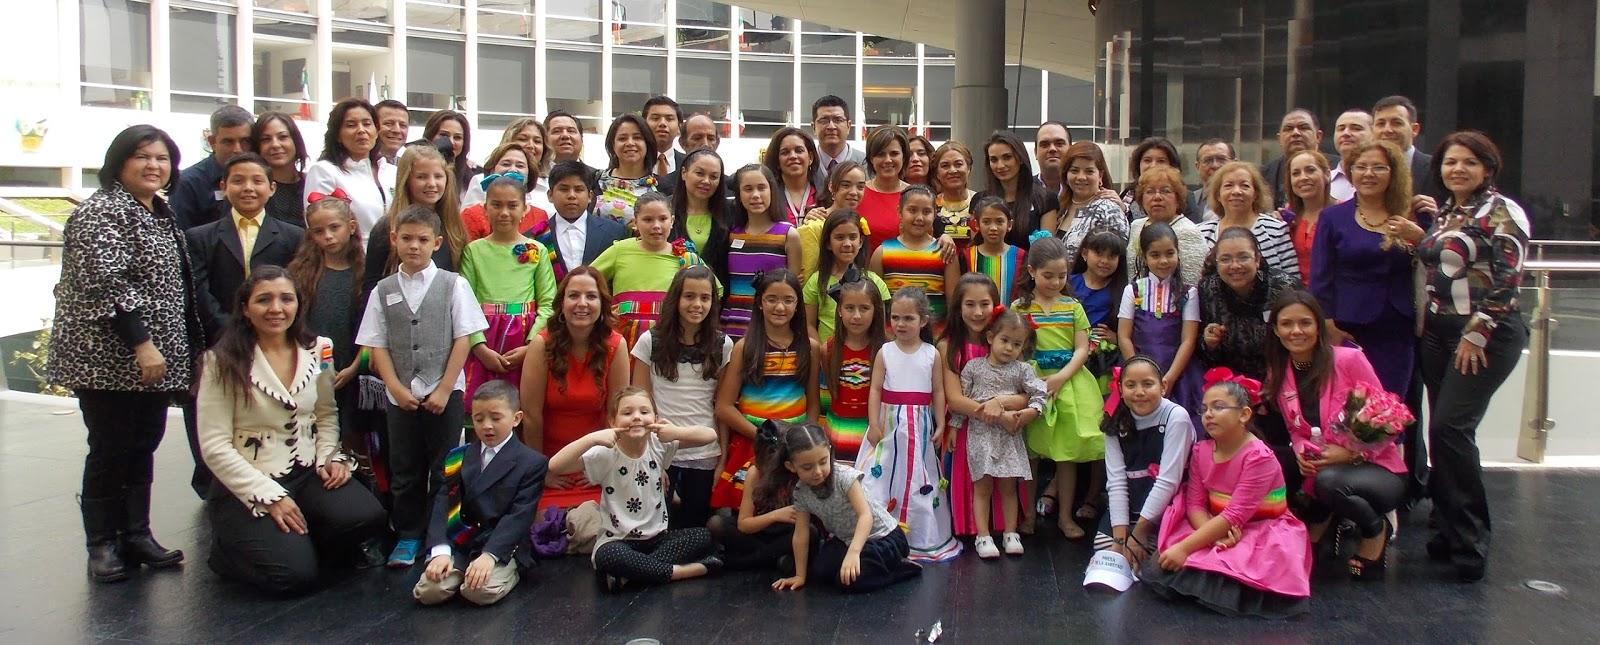 Hilda flores escalera senadora inauguraci n de la for Blanca lilia romero cenipalma